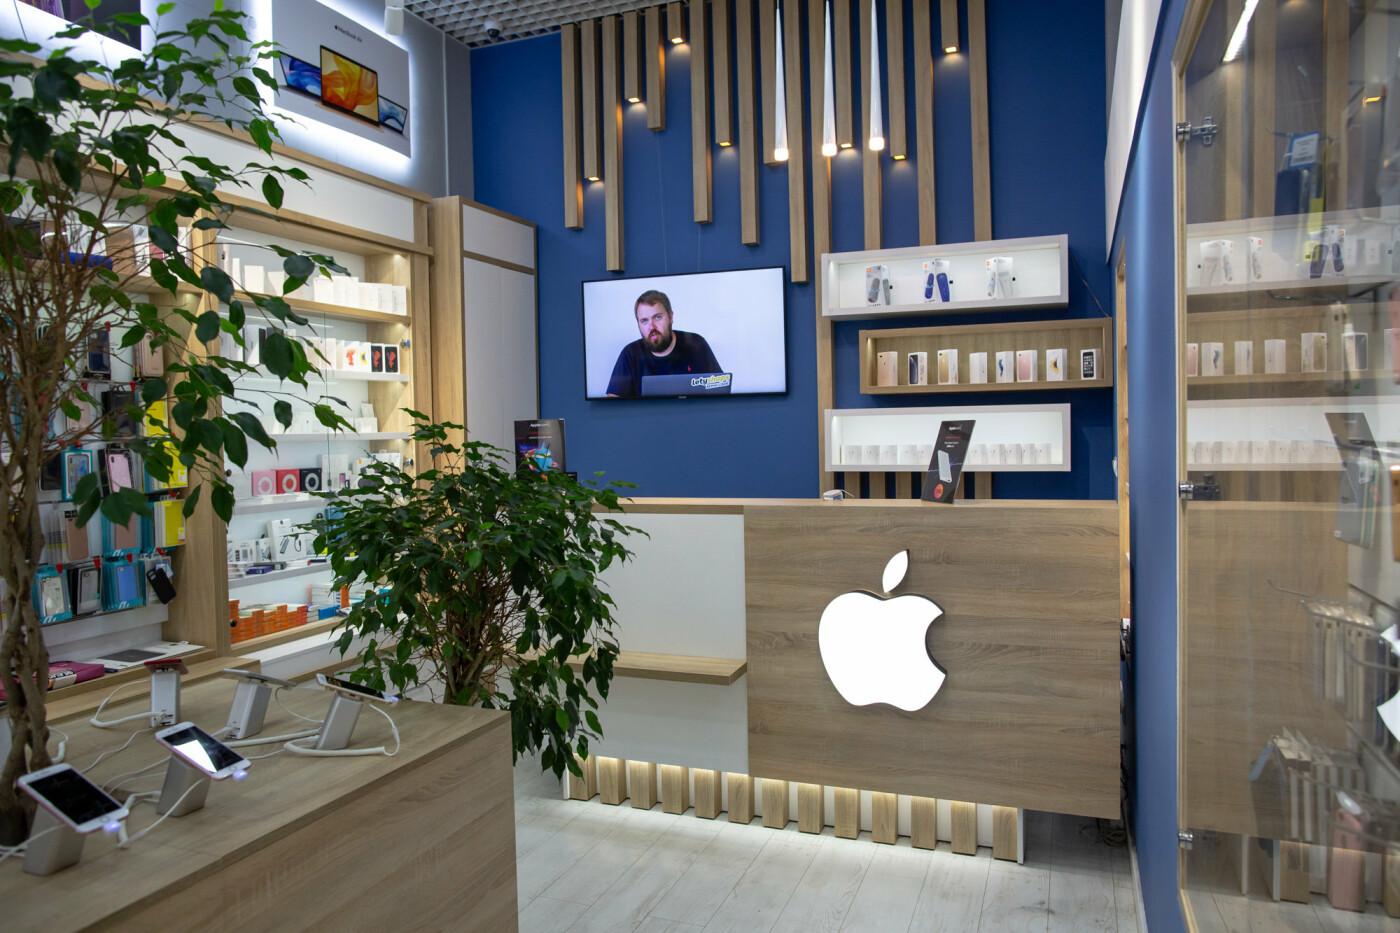 iPhone SE 2020 – найдешевший смартфон Apple вже в Apple Room, фото-3